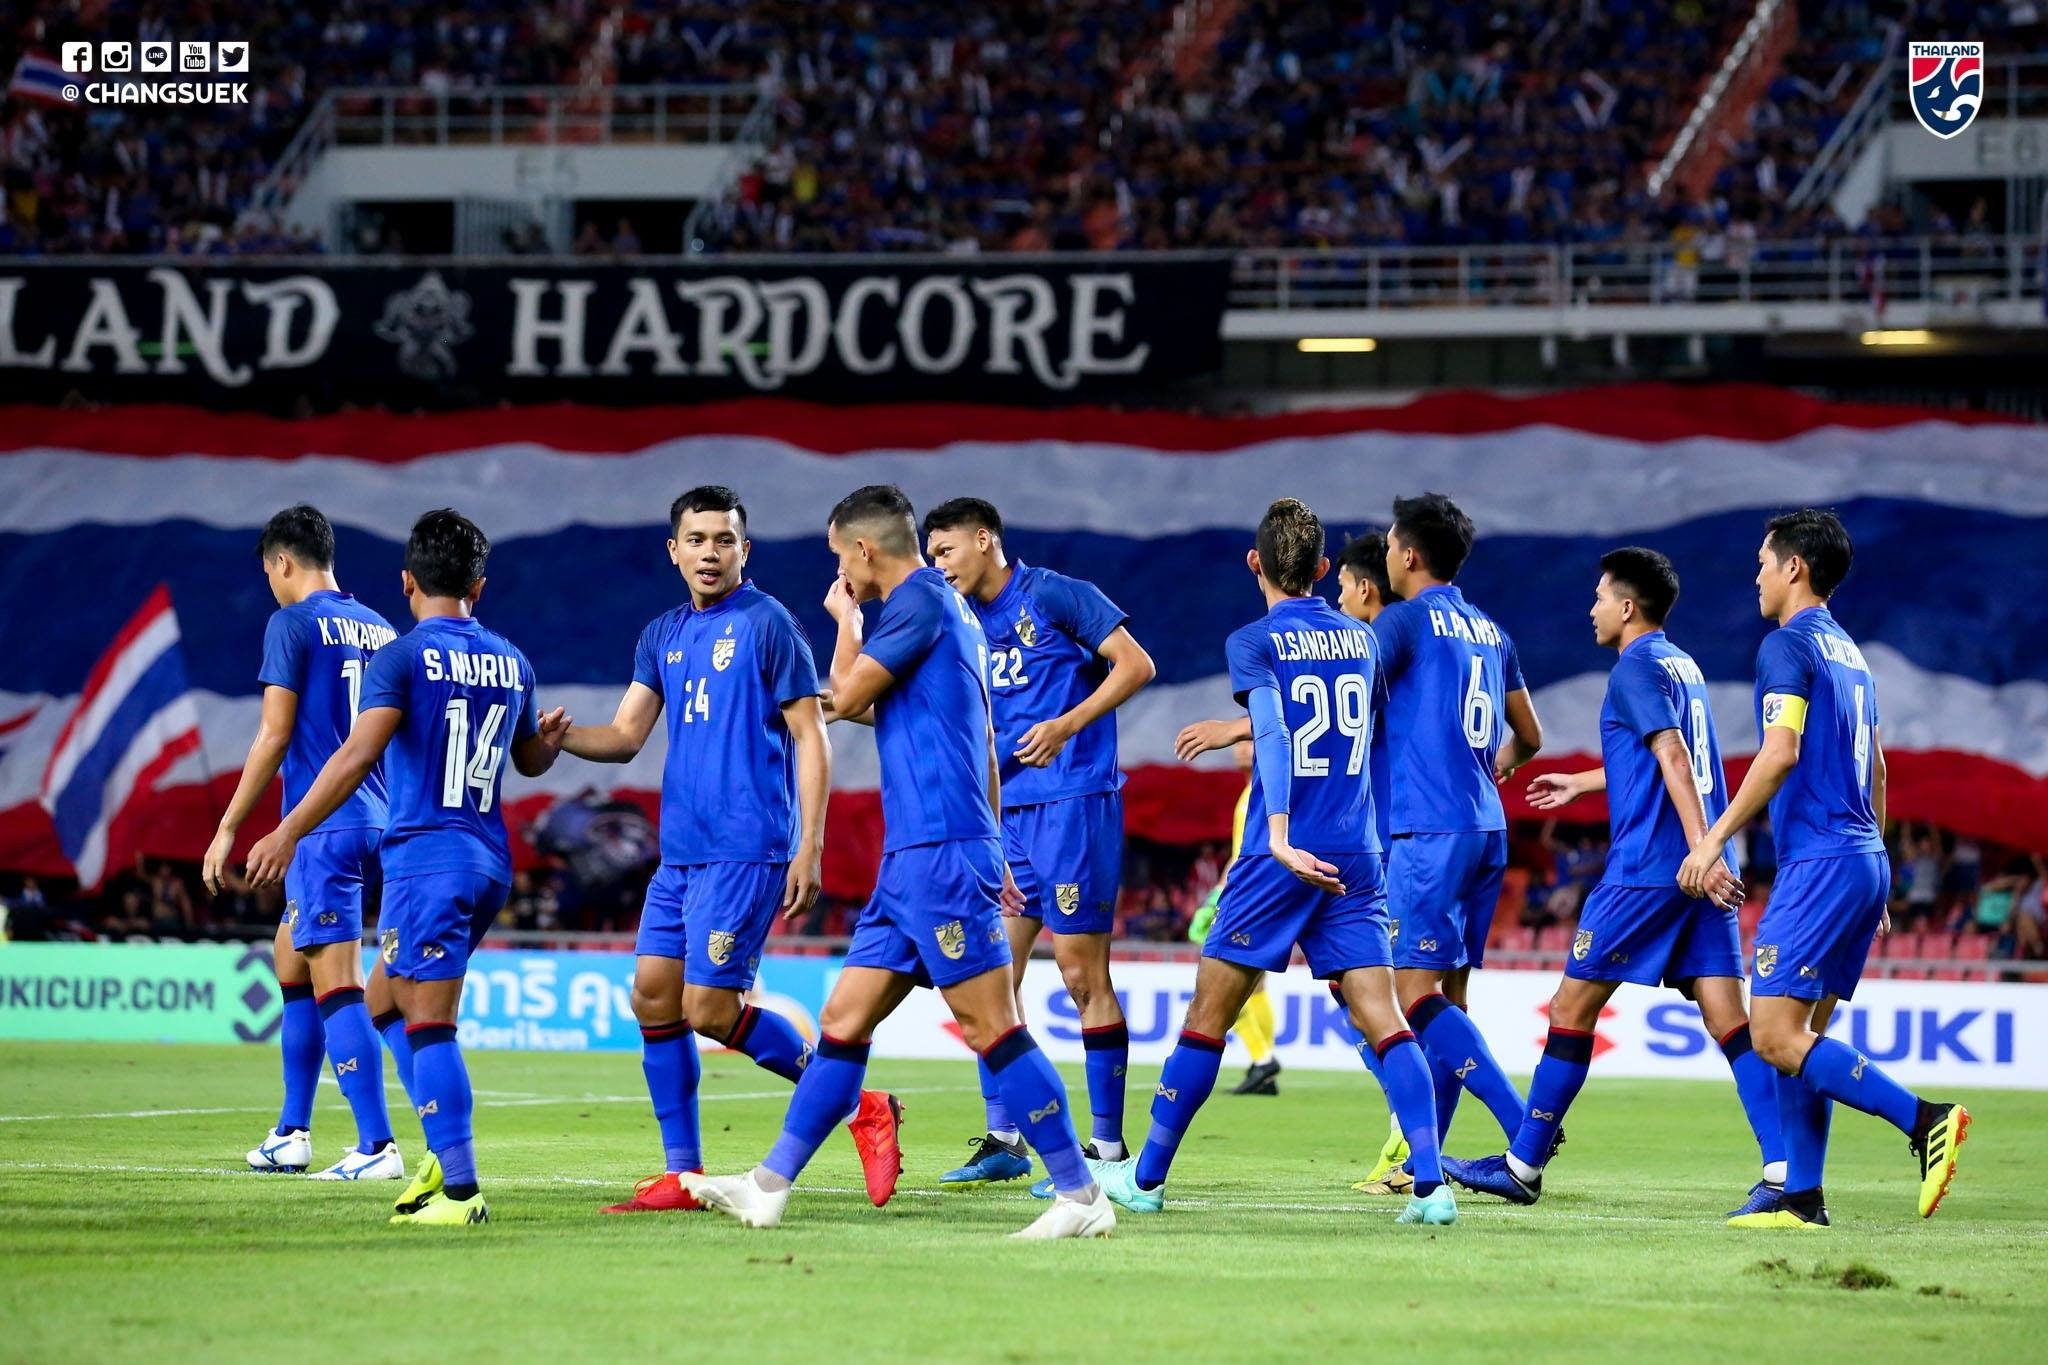 Fact หลังเกม : 5 ข้อดีที่ได้เห็นหลัง ทีมชาติไทย ถล่ม สิงคโปร์ 3-0